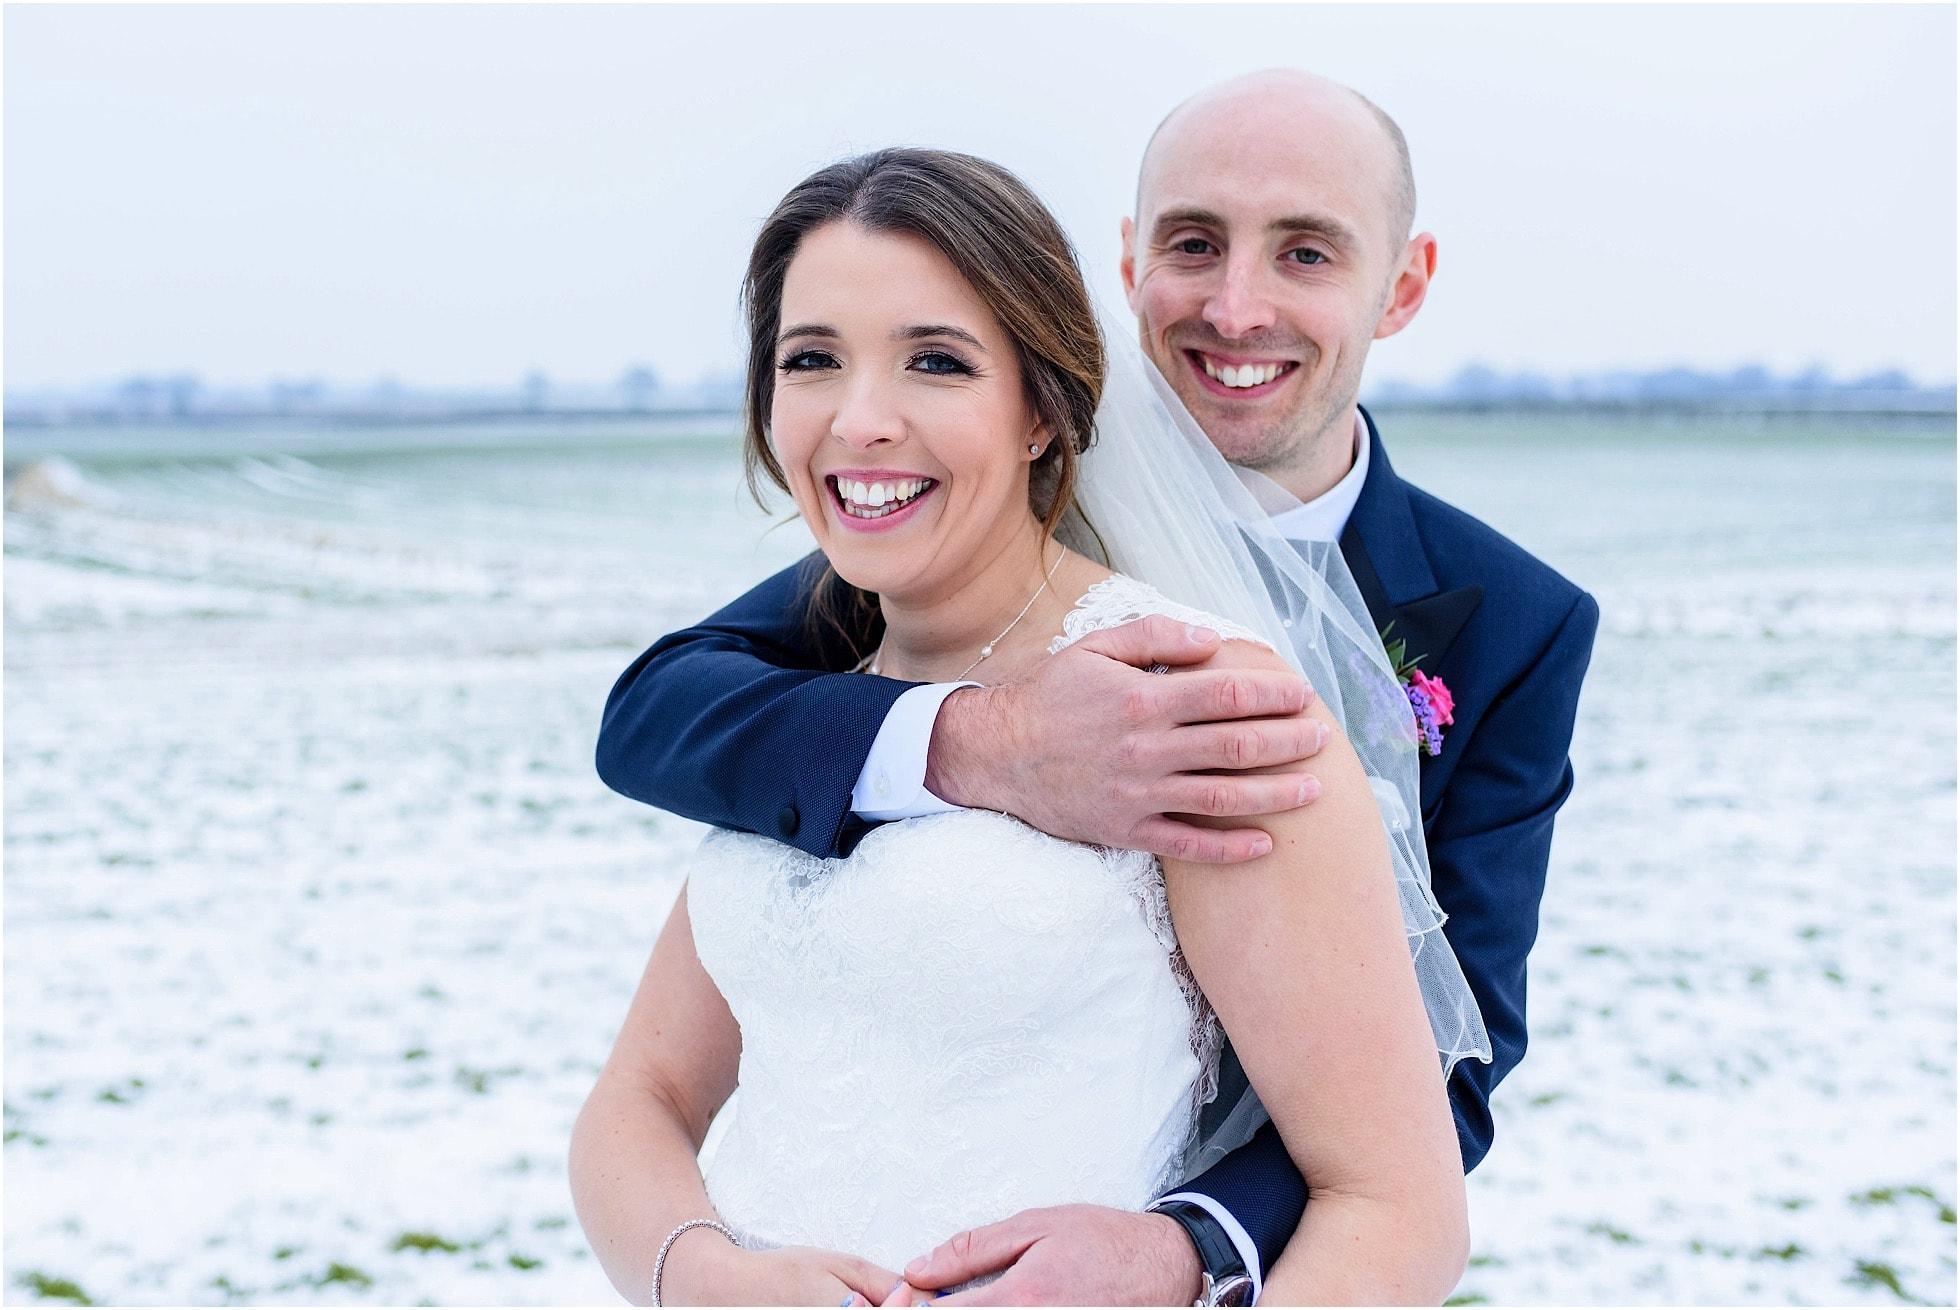 Snowy wedding photo in Yorkshire